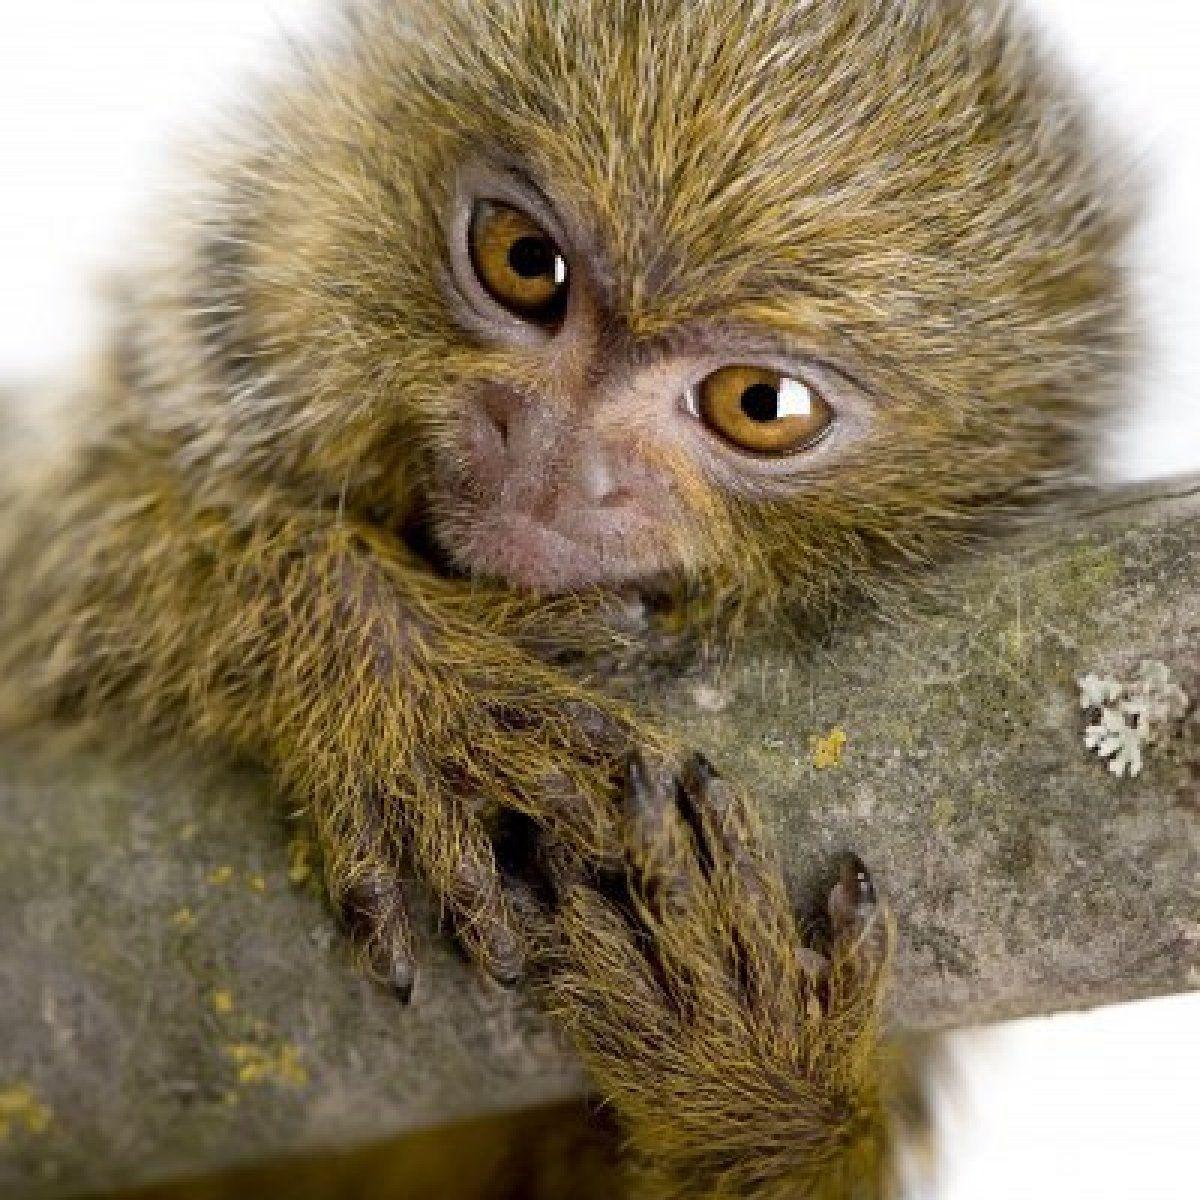 Stock Photo Pygmy Marmoset Mammals Marmoset Monkey